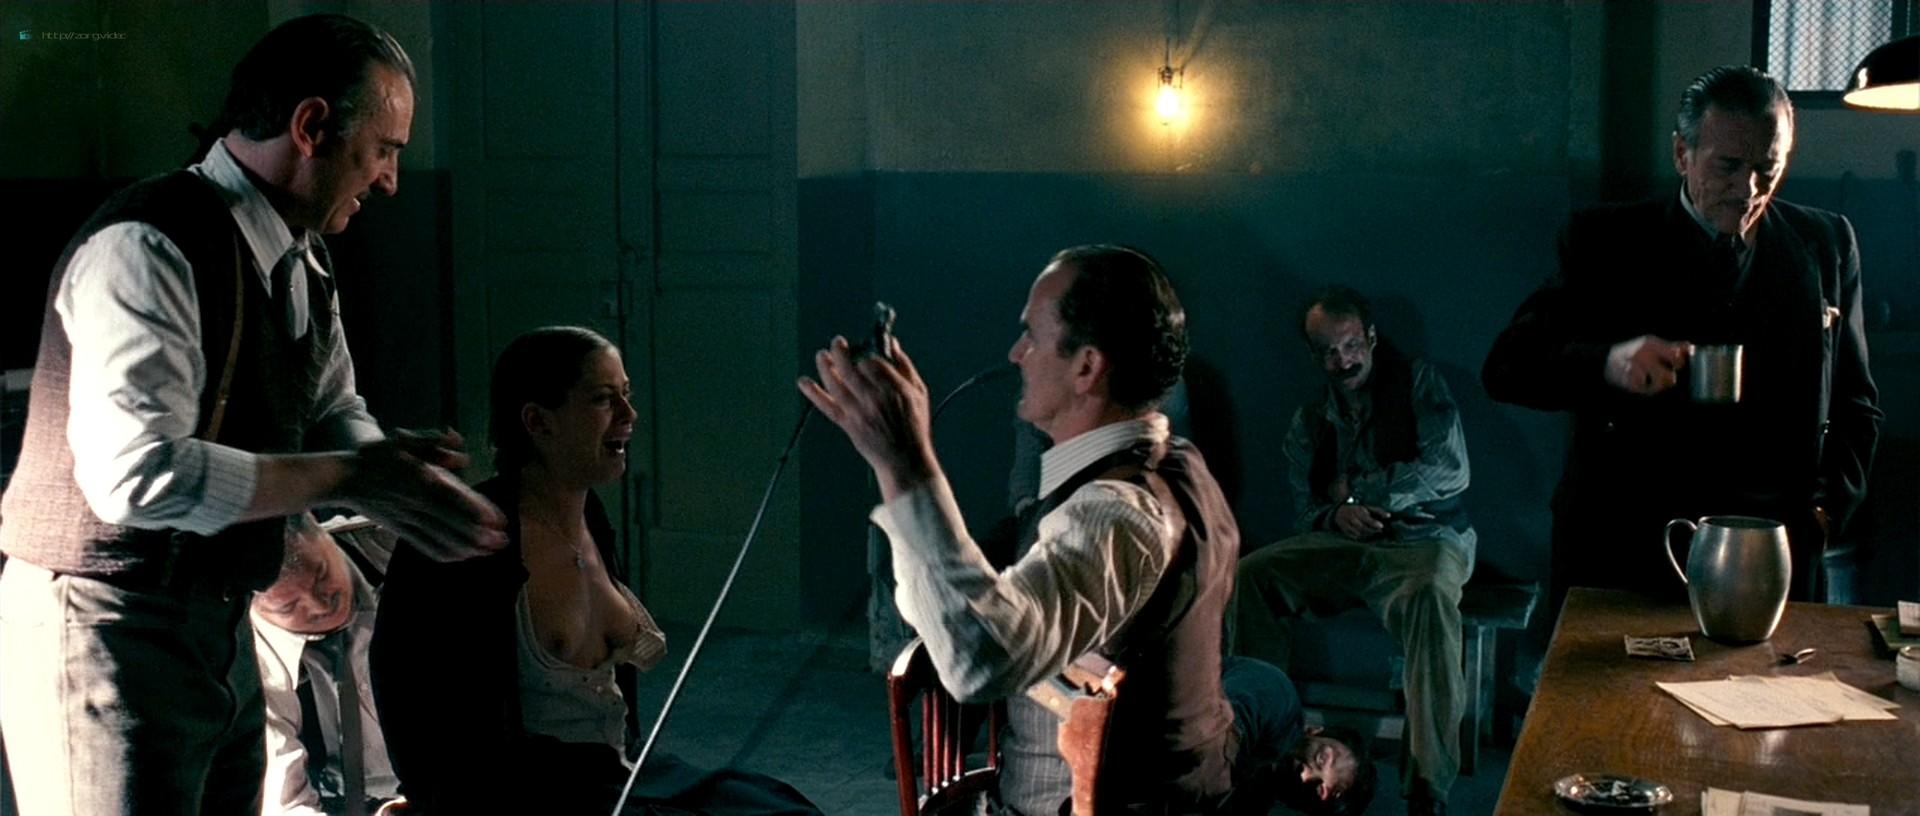 Maria Leon nude in - La voz dormida (2011) HD 1080p BluRay (9)